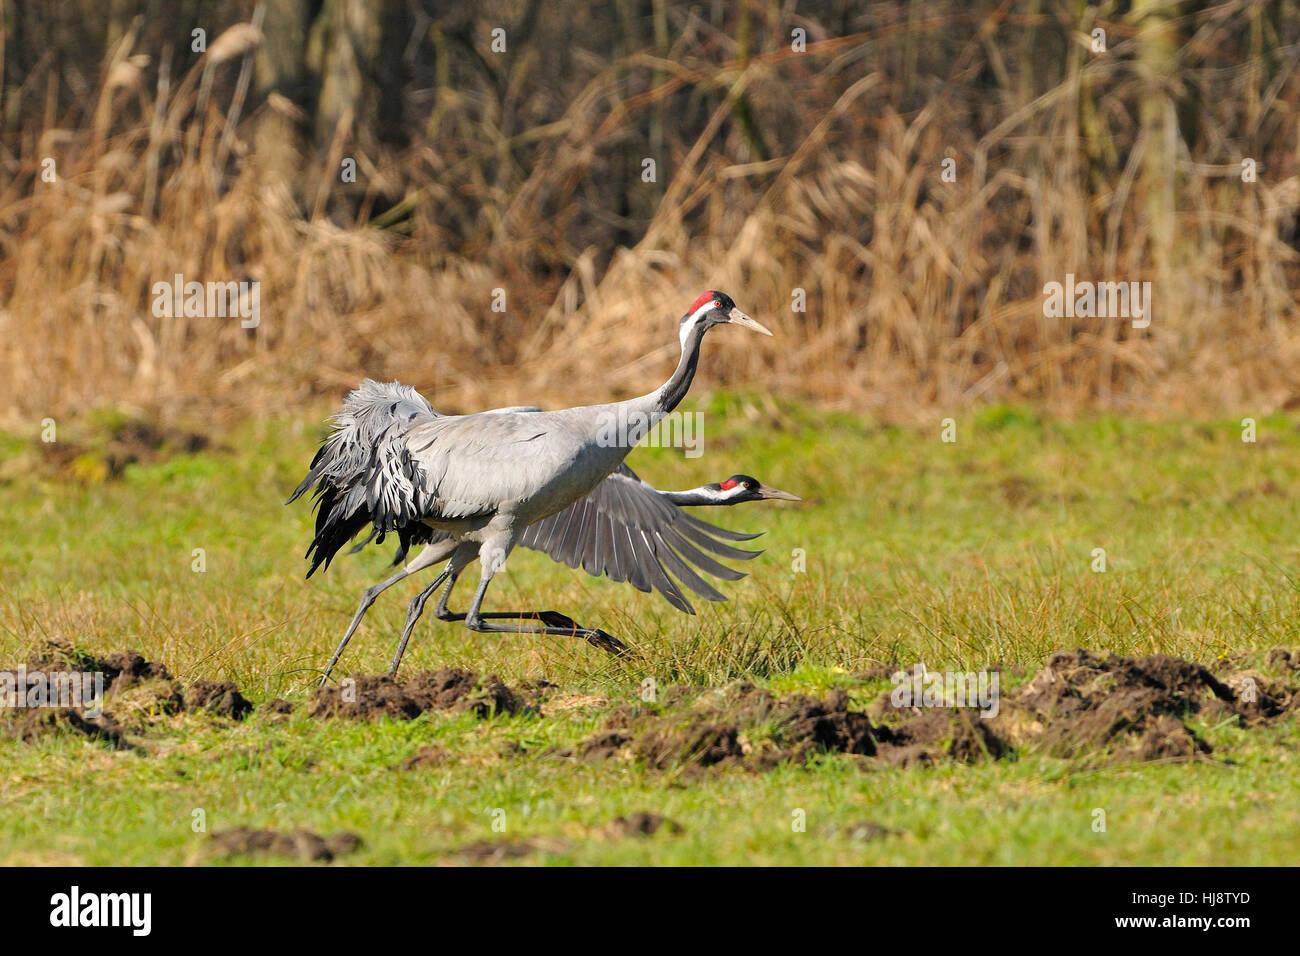 spring, crane, bird, animals, birds, location shot, spring, outside, wildlife, Stock Photo